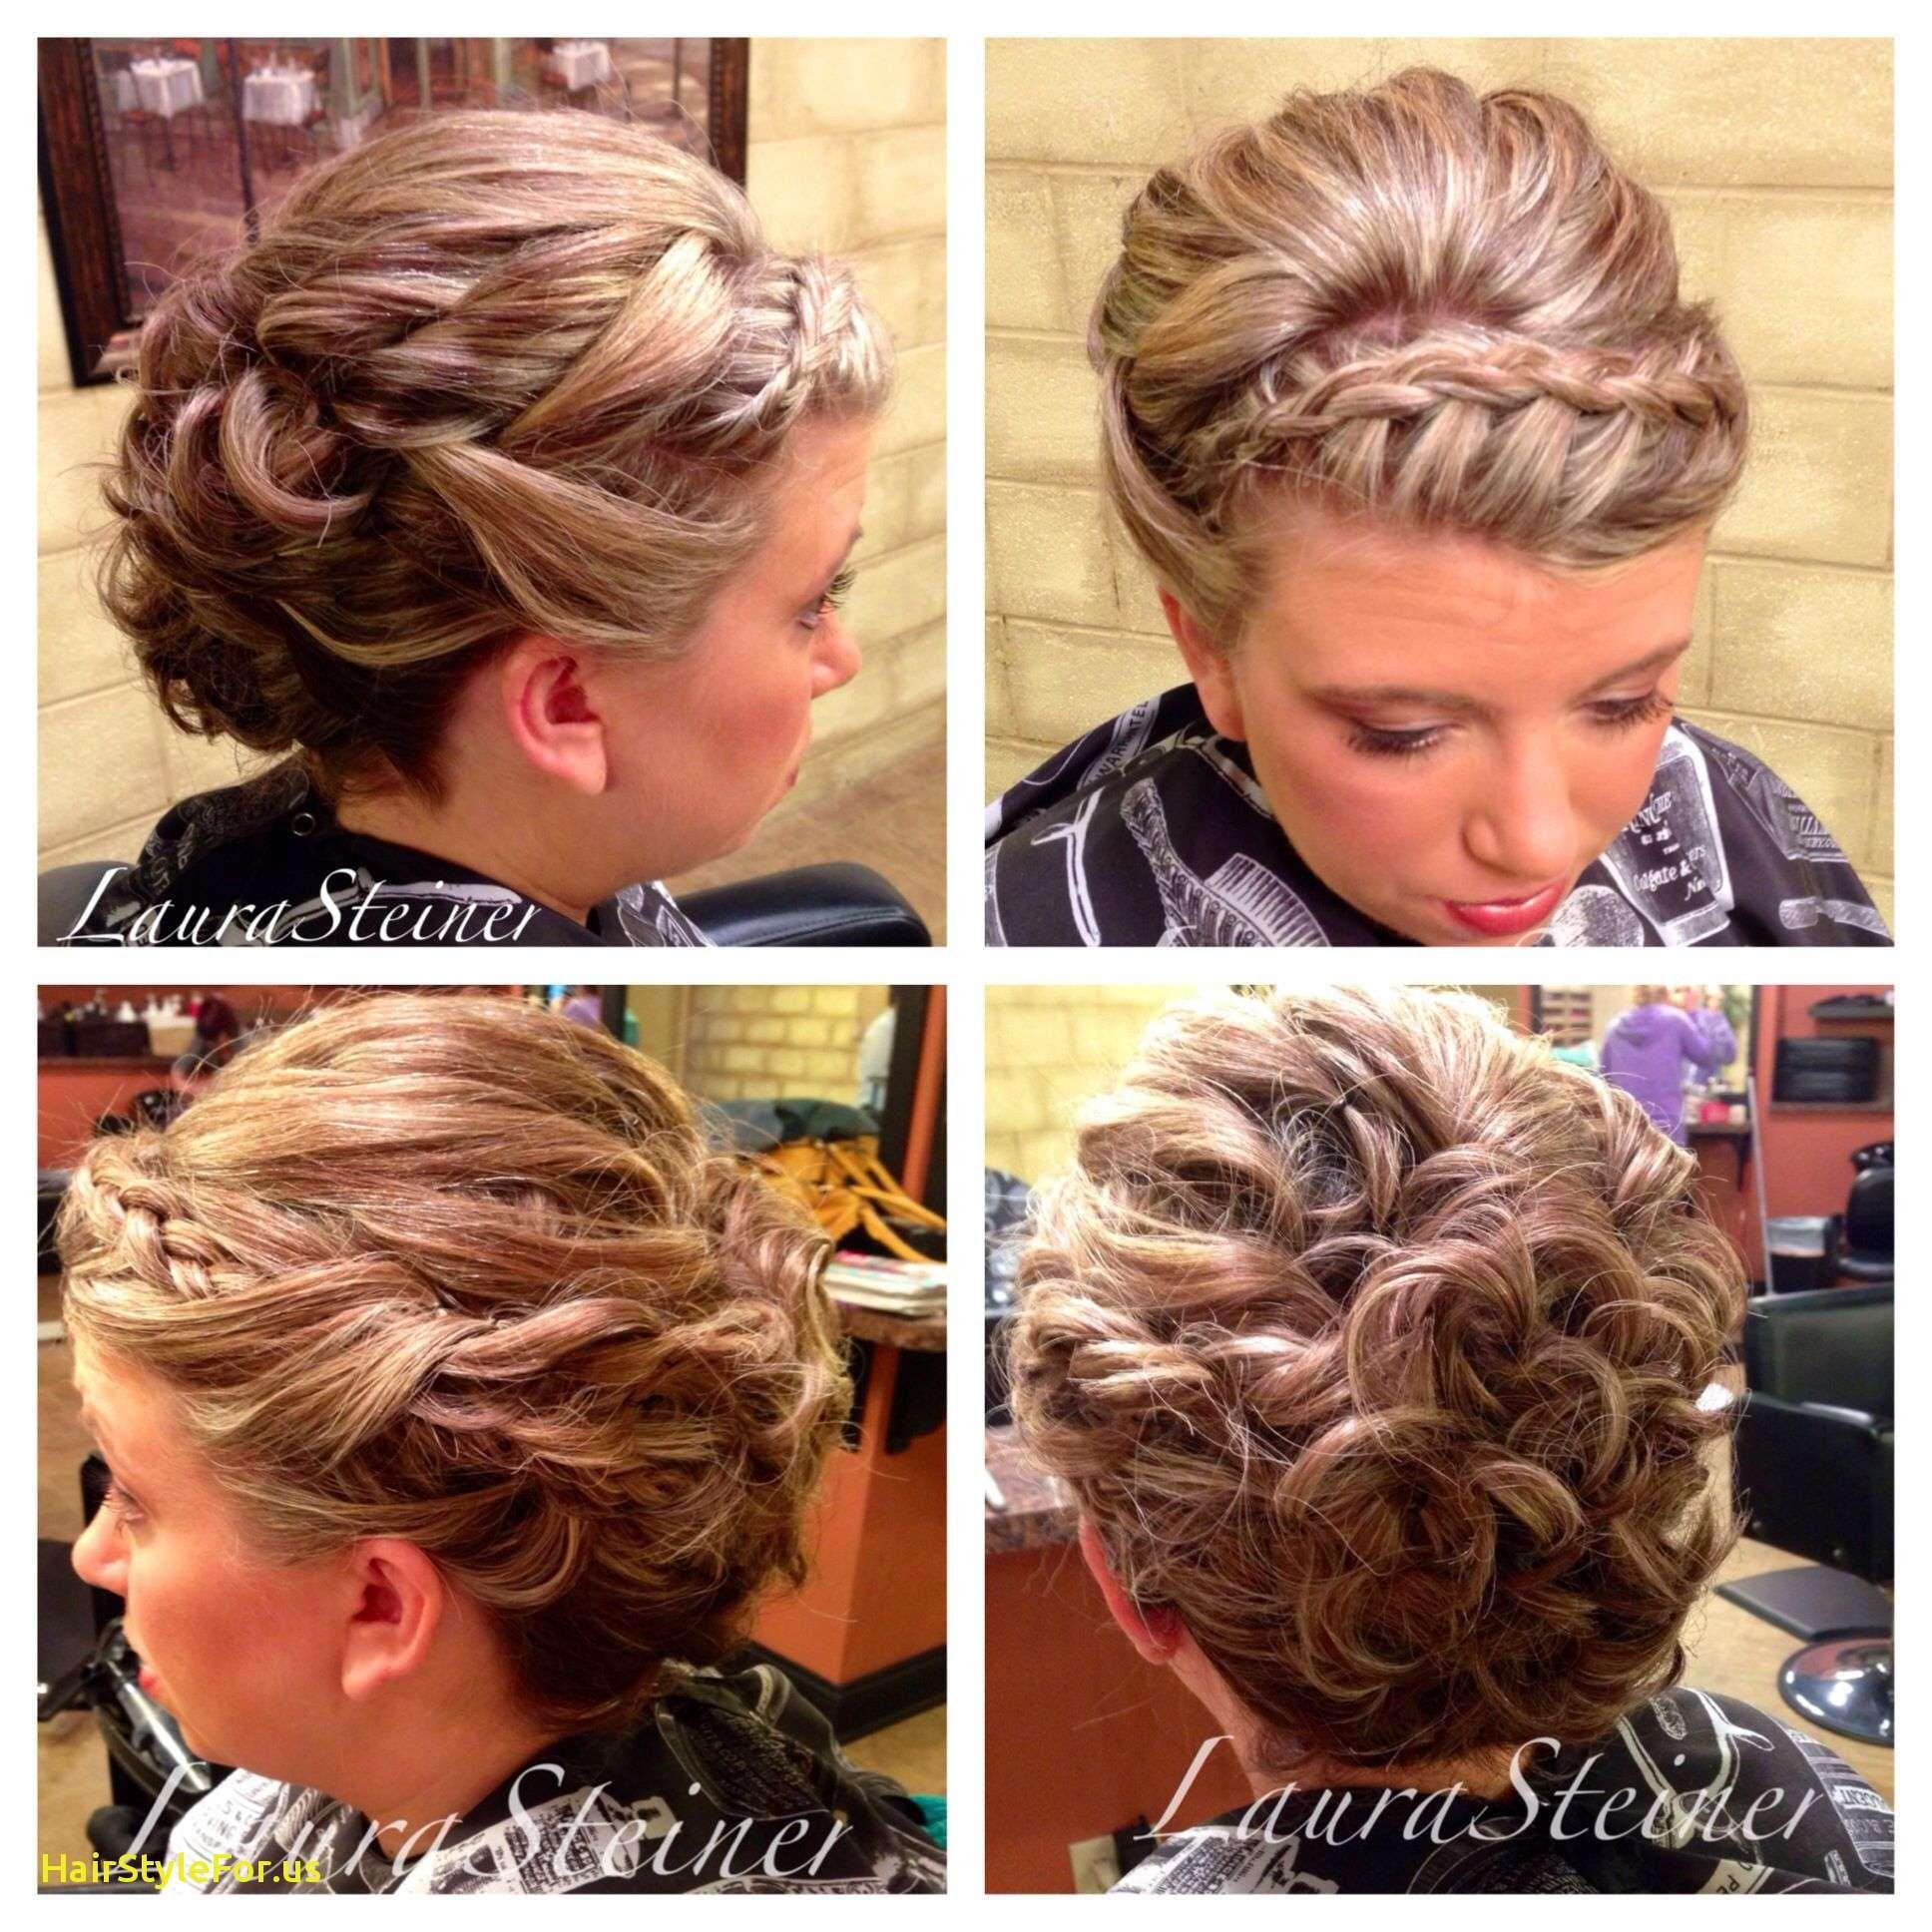 Top formal hairstyles headbands christina fox top formal